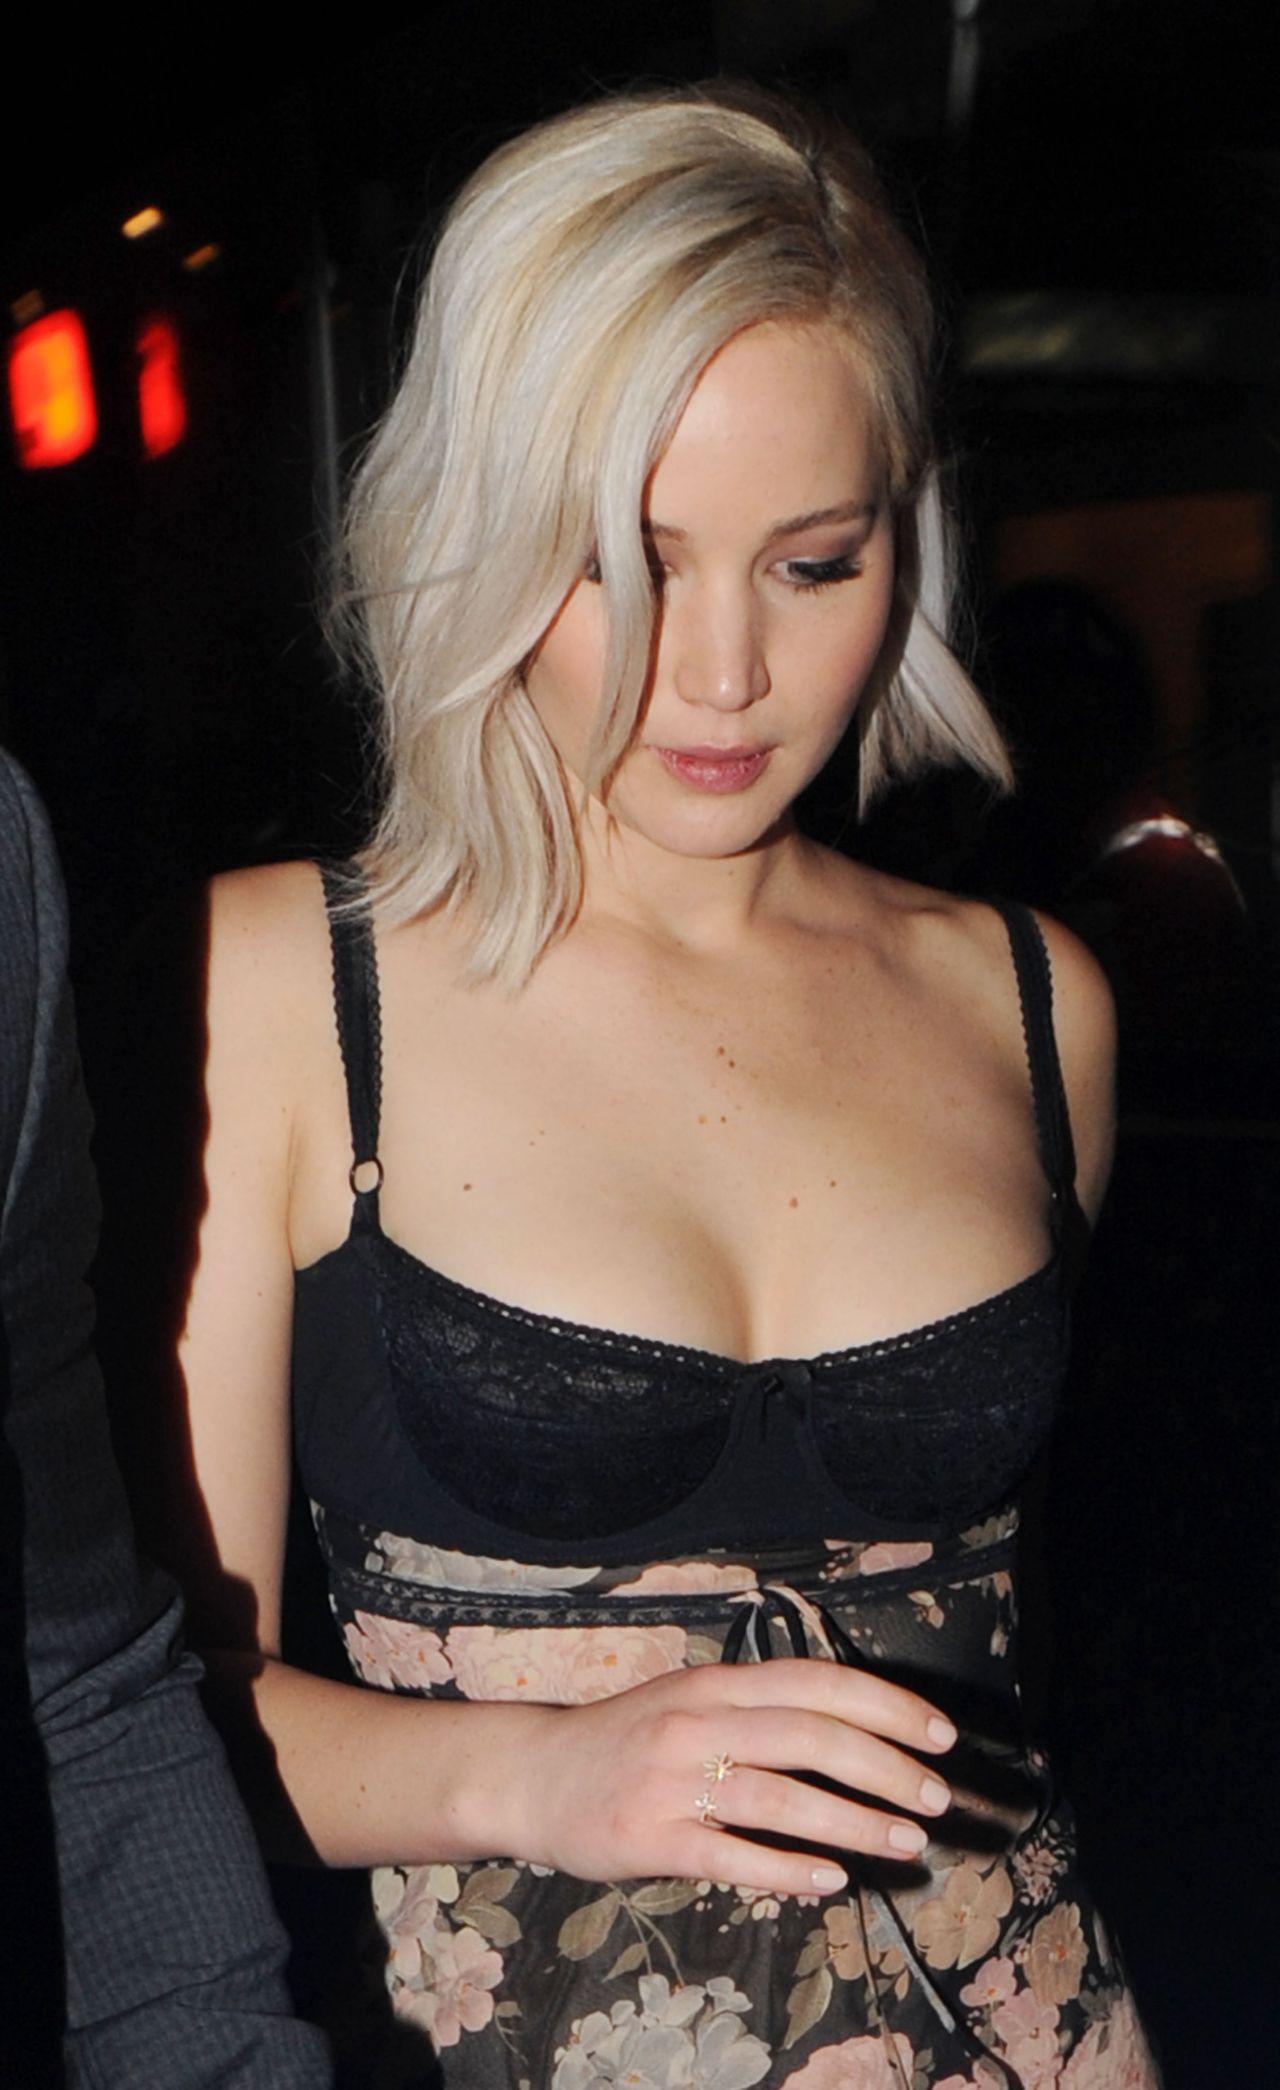 Jennifer Lawrence Night Out Style - London 592016-6692